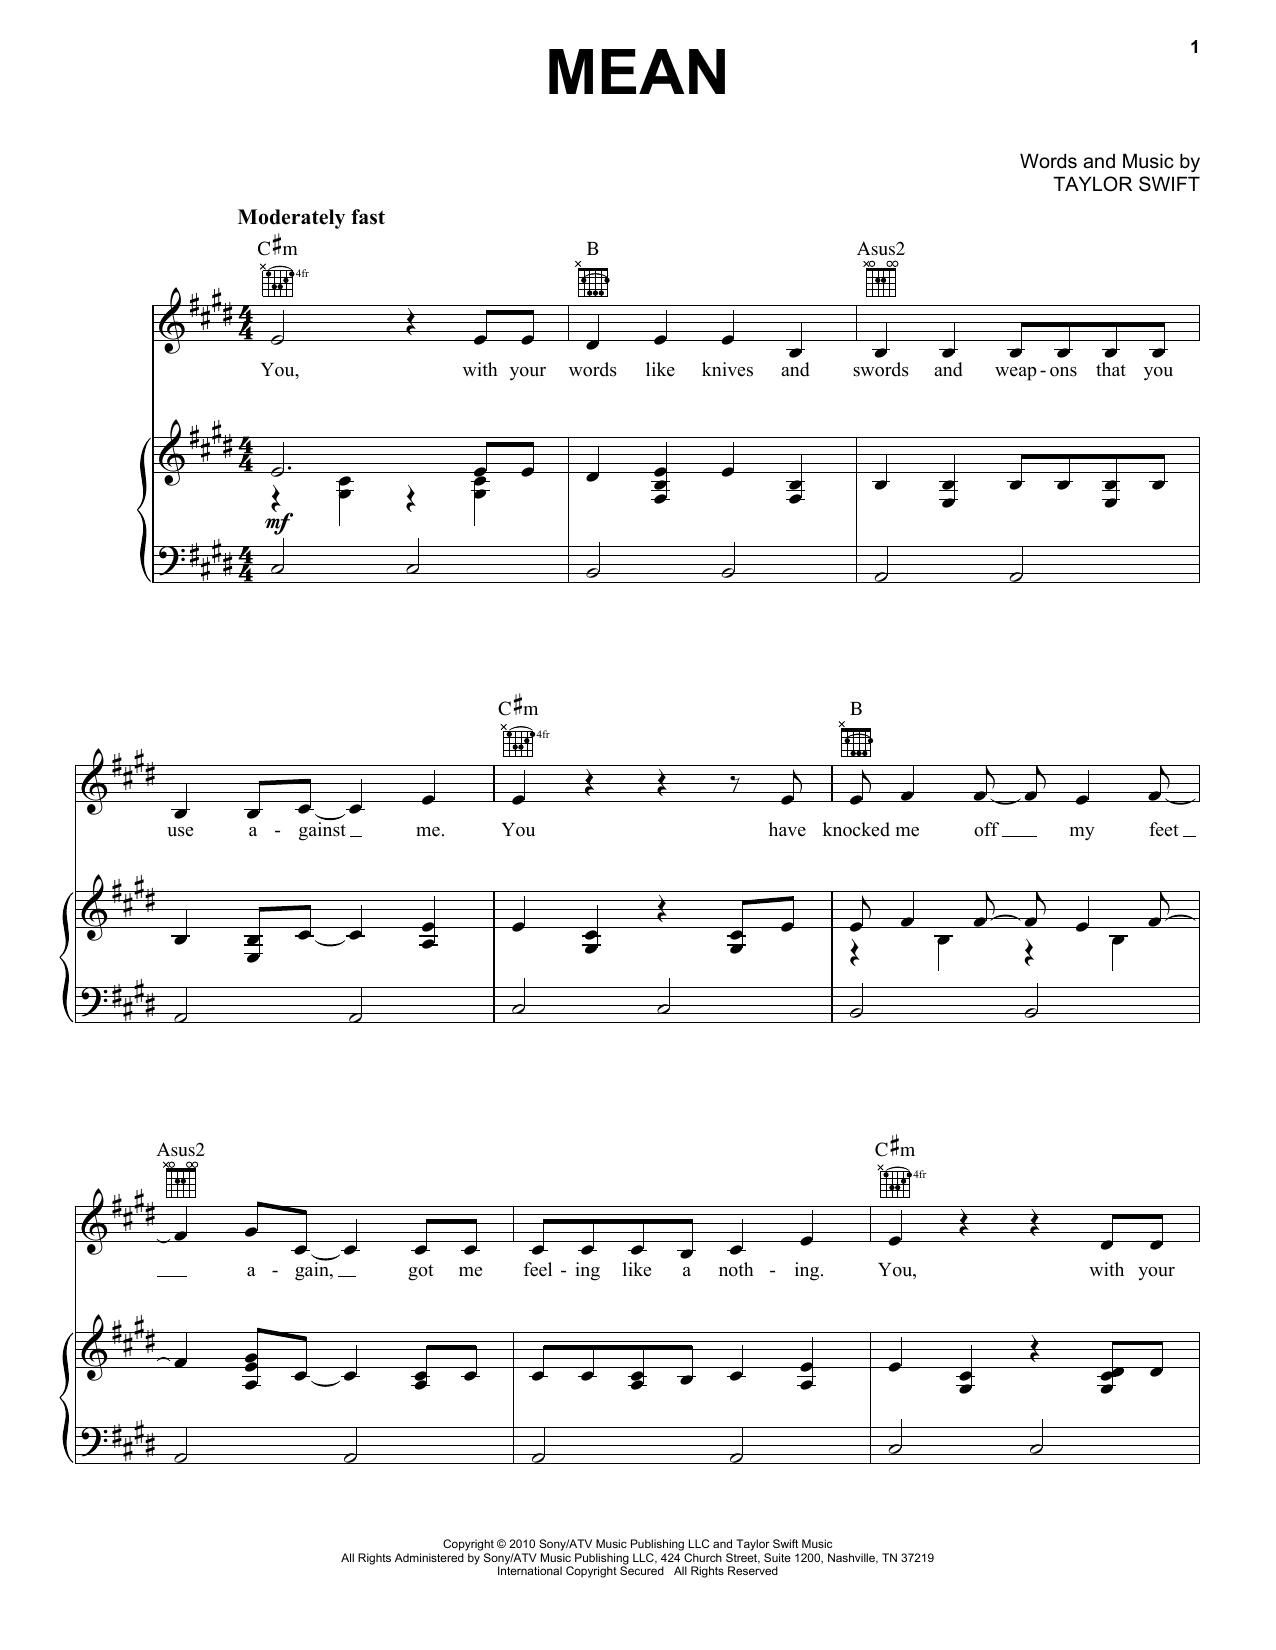 Mean sheet music